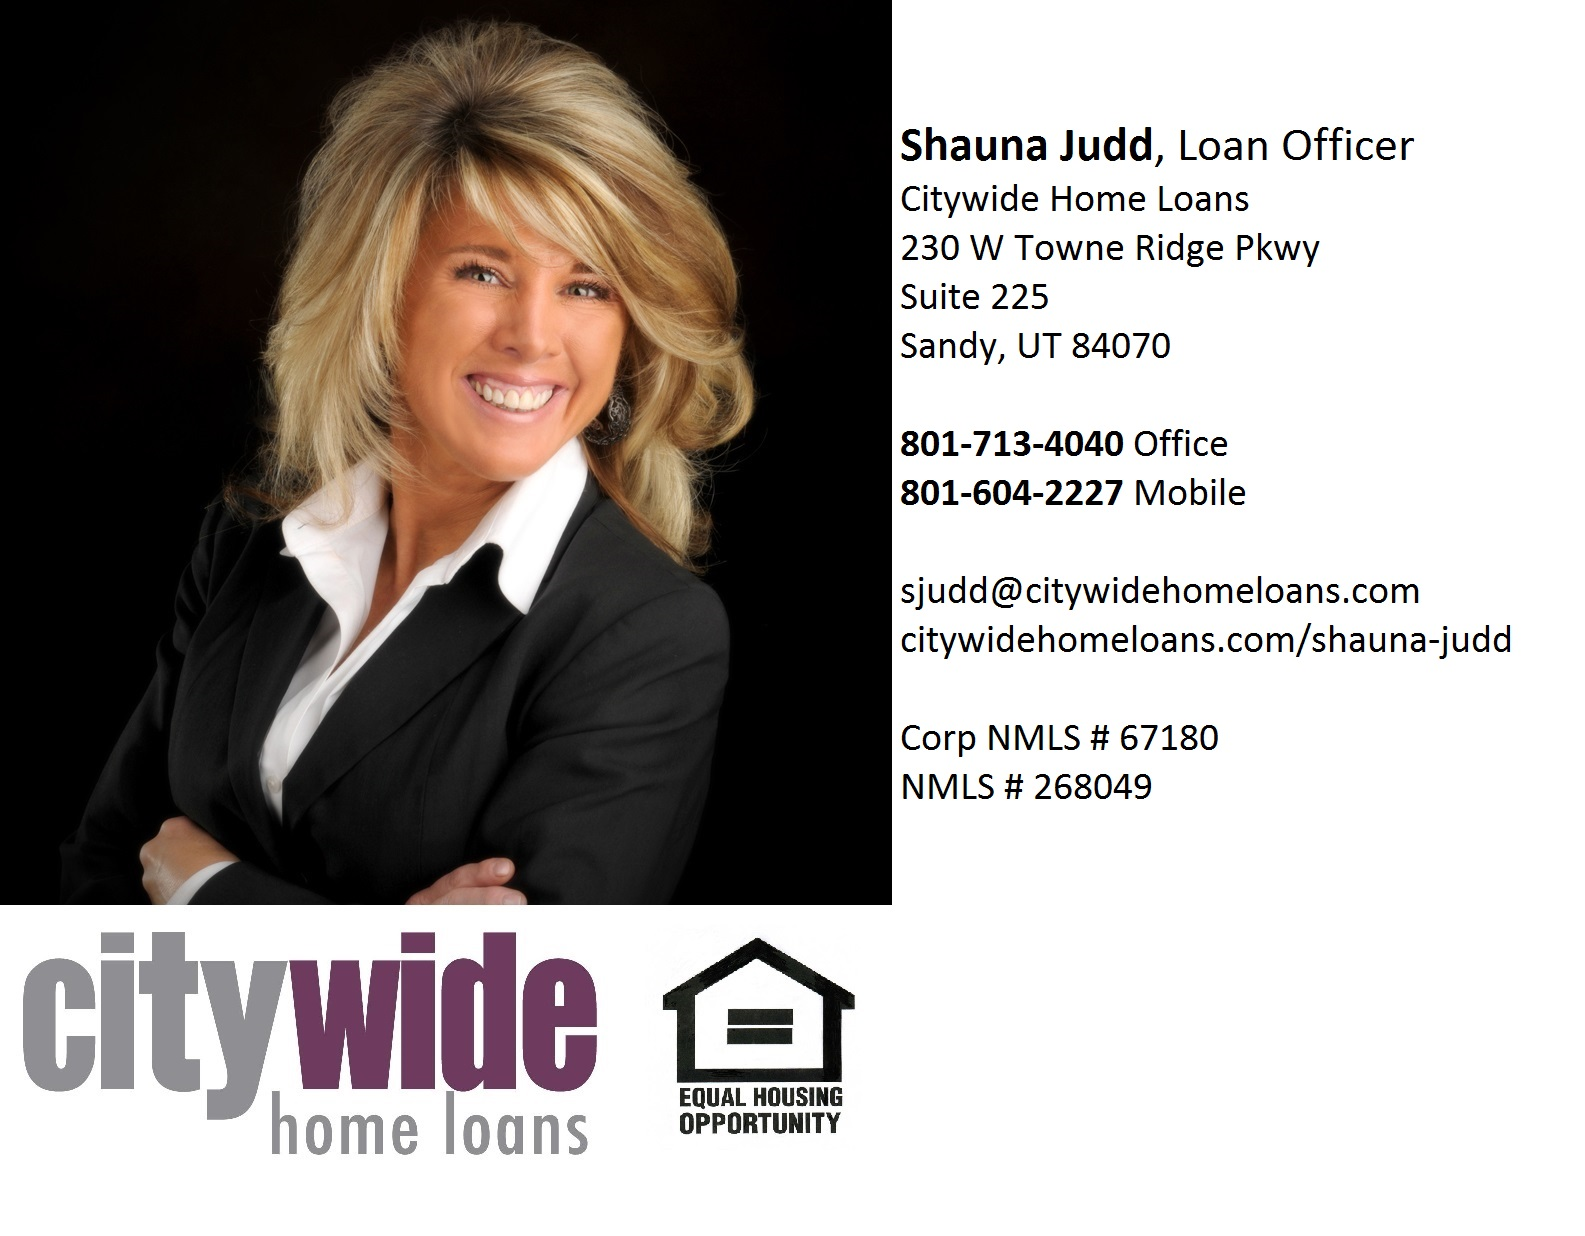 loan media guild photo facebook s shared home mortgage omarprietoteam company id omar officer prieto office